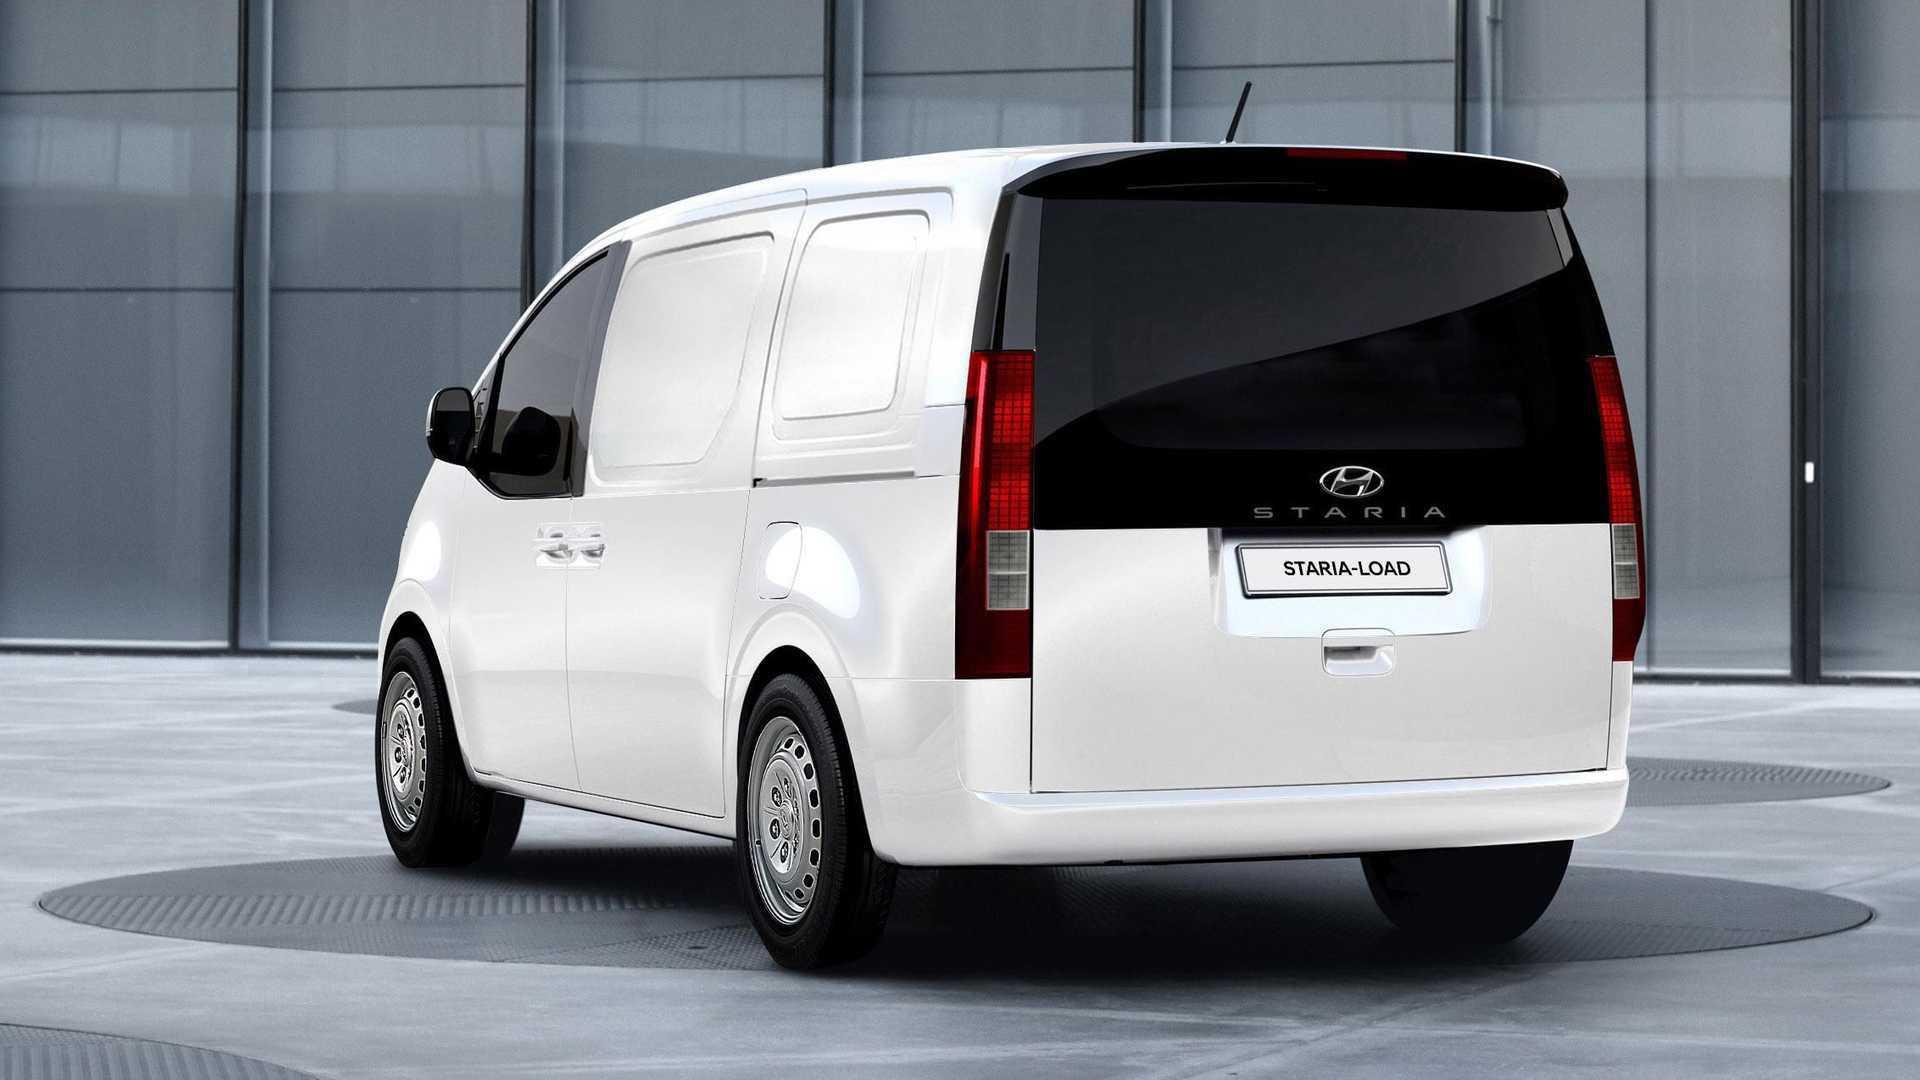 Hyundai_Staria_Load-0007